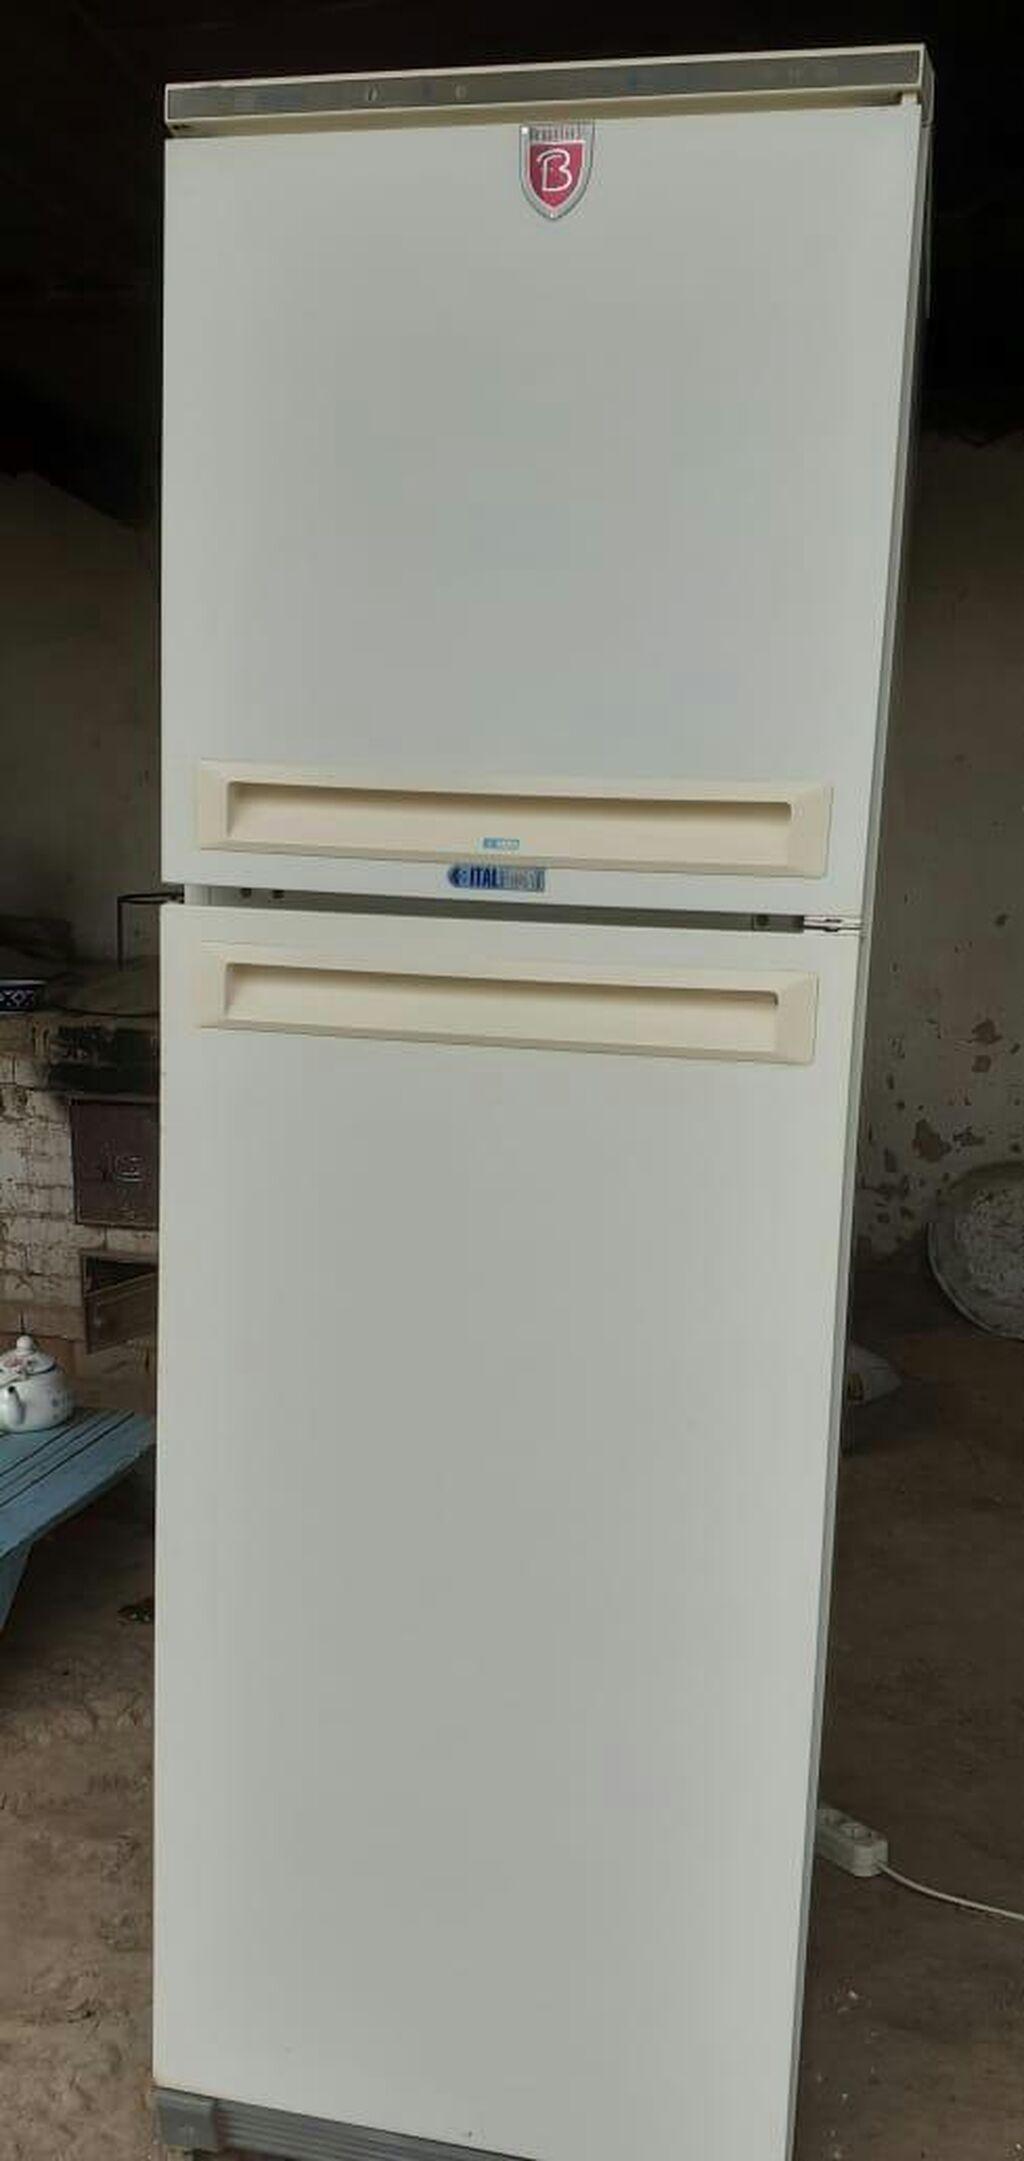 Б/у Двухкамерный Белый холодильник: Б/у Двухкамерный Белый холодильник